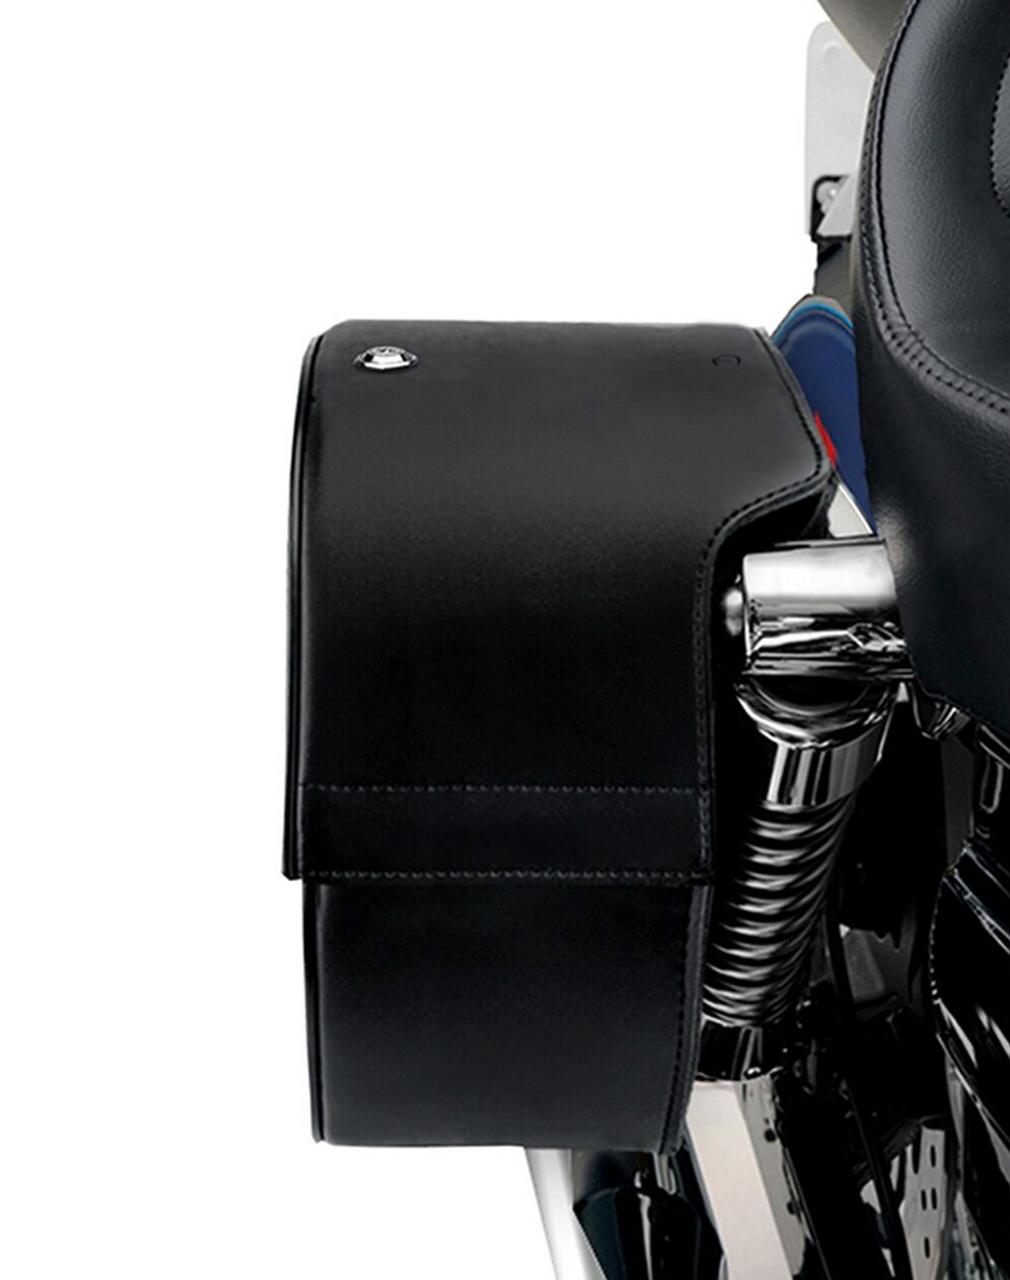 Kawasaki Vulcan 1500 Classic Shock Cutout Warrior Slanted Large Motorcycle Saddlebags Shock Cutout View